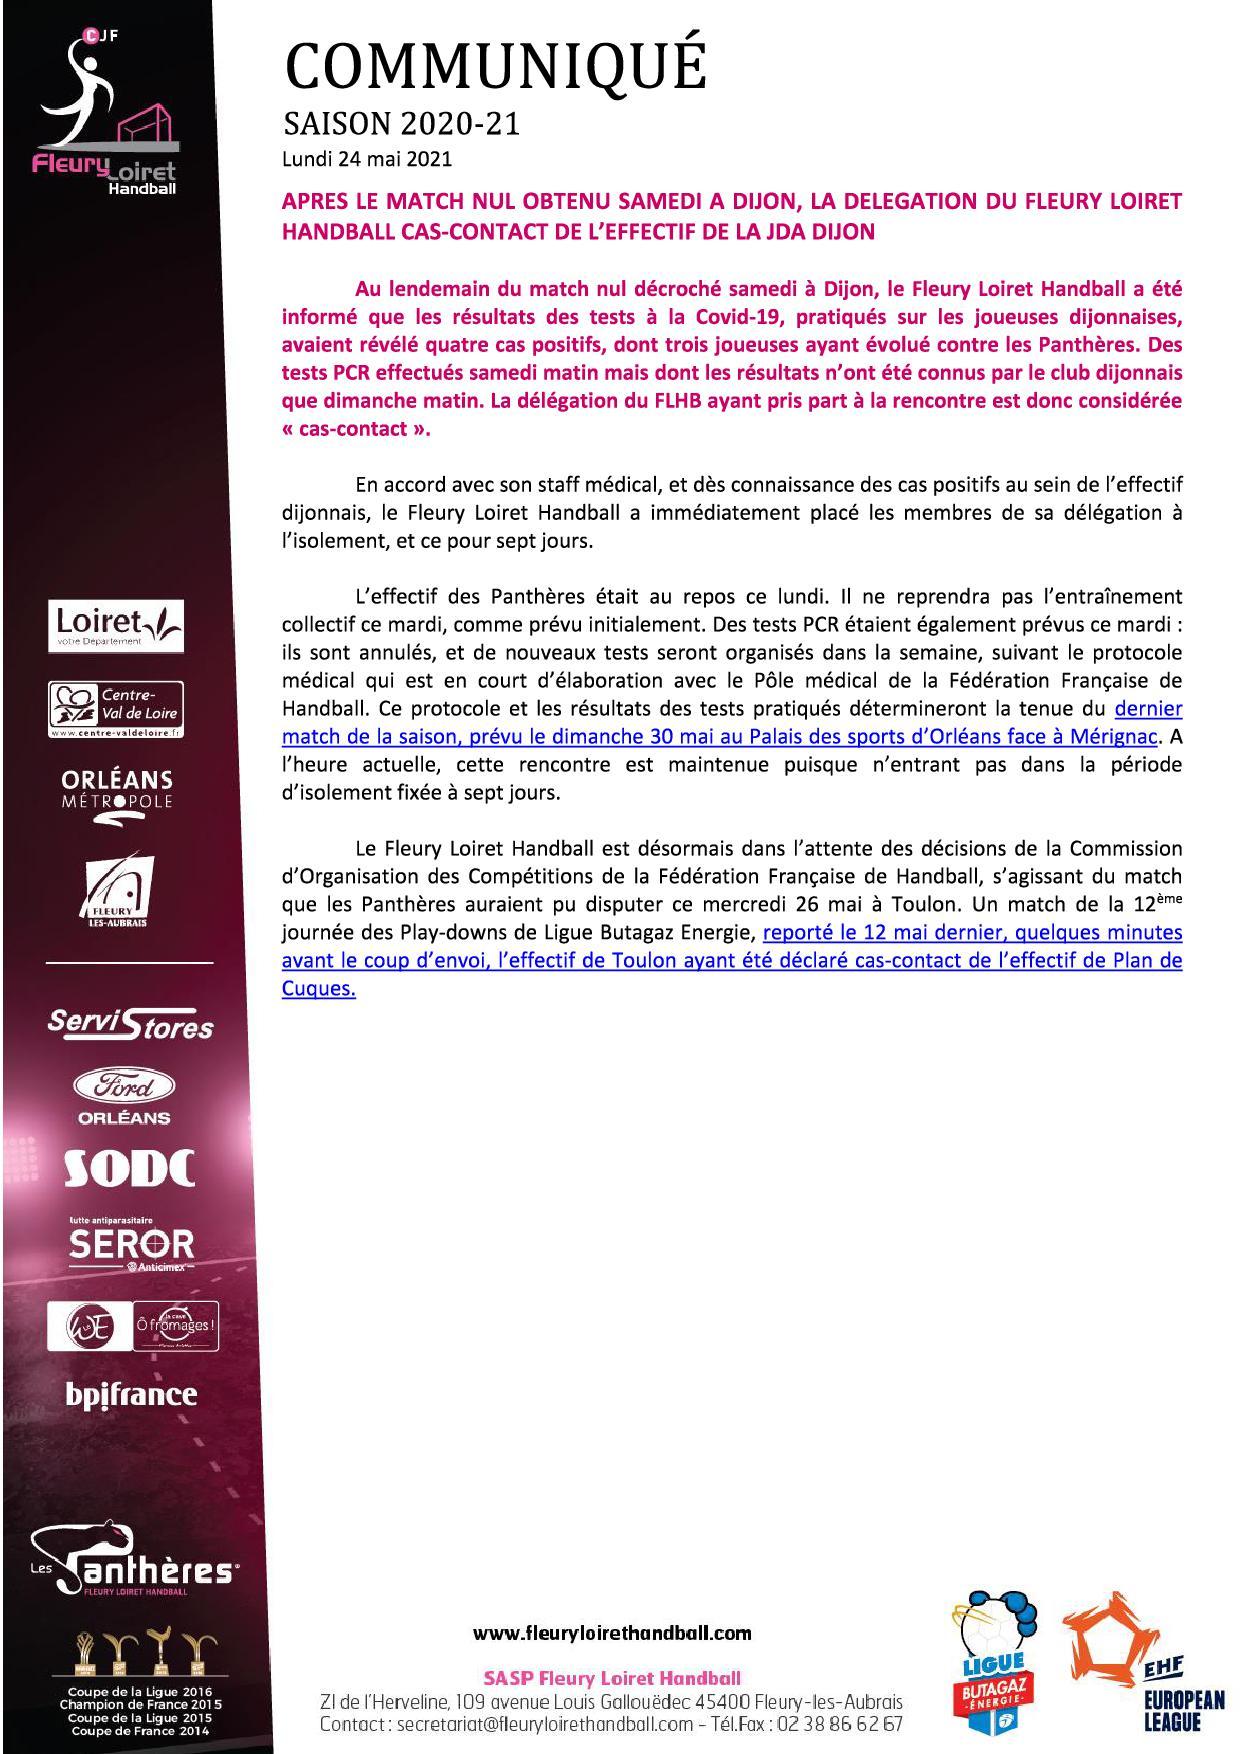 Communiqué Fleury Loiret Handball - Lundi 24 mai 2021.jpg